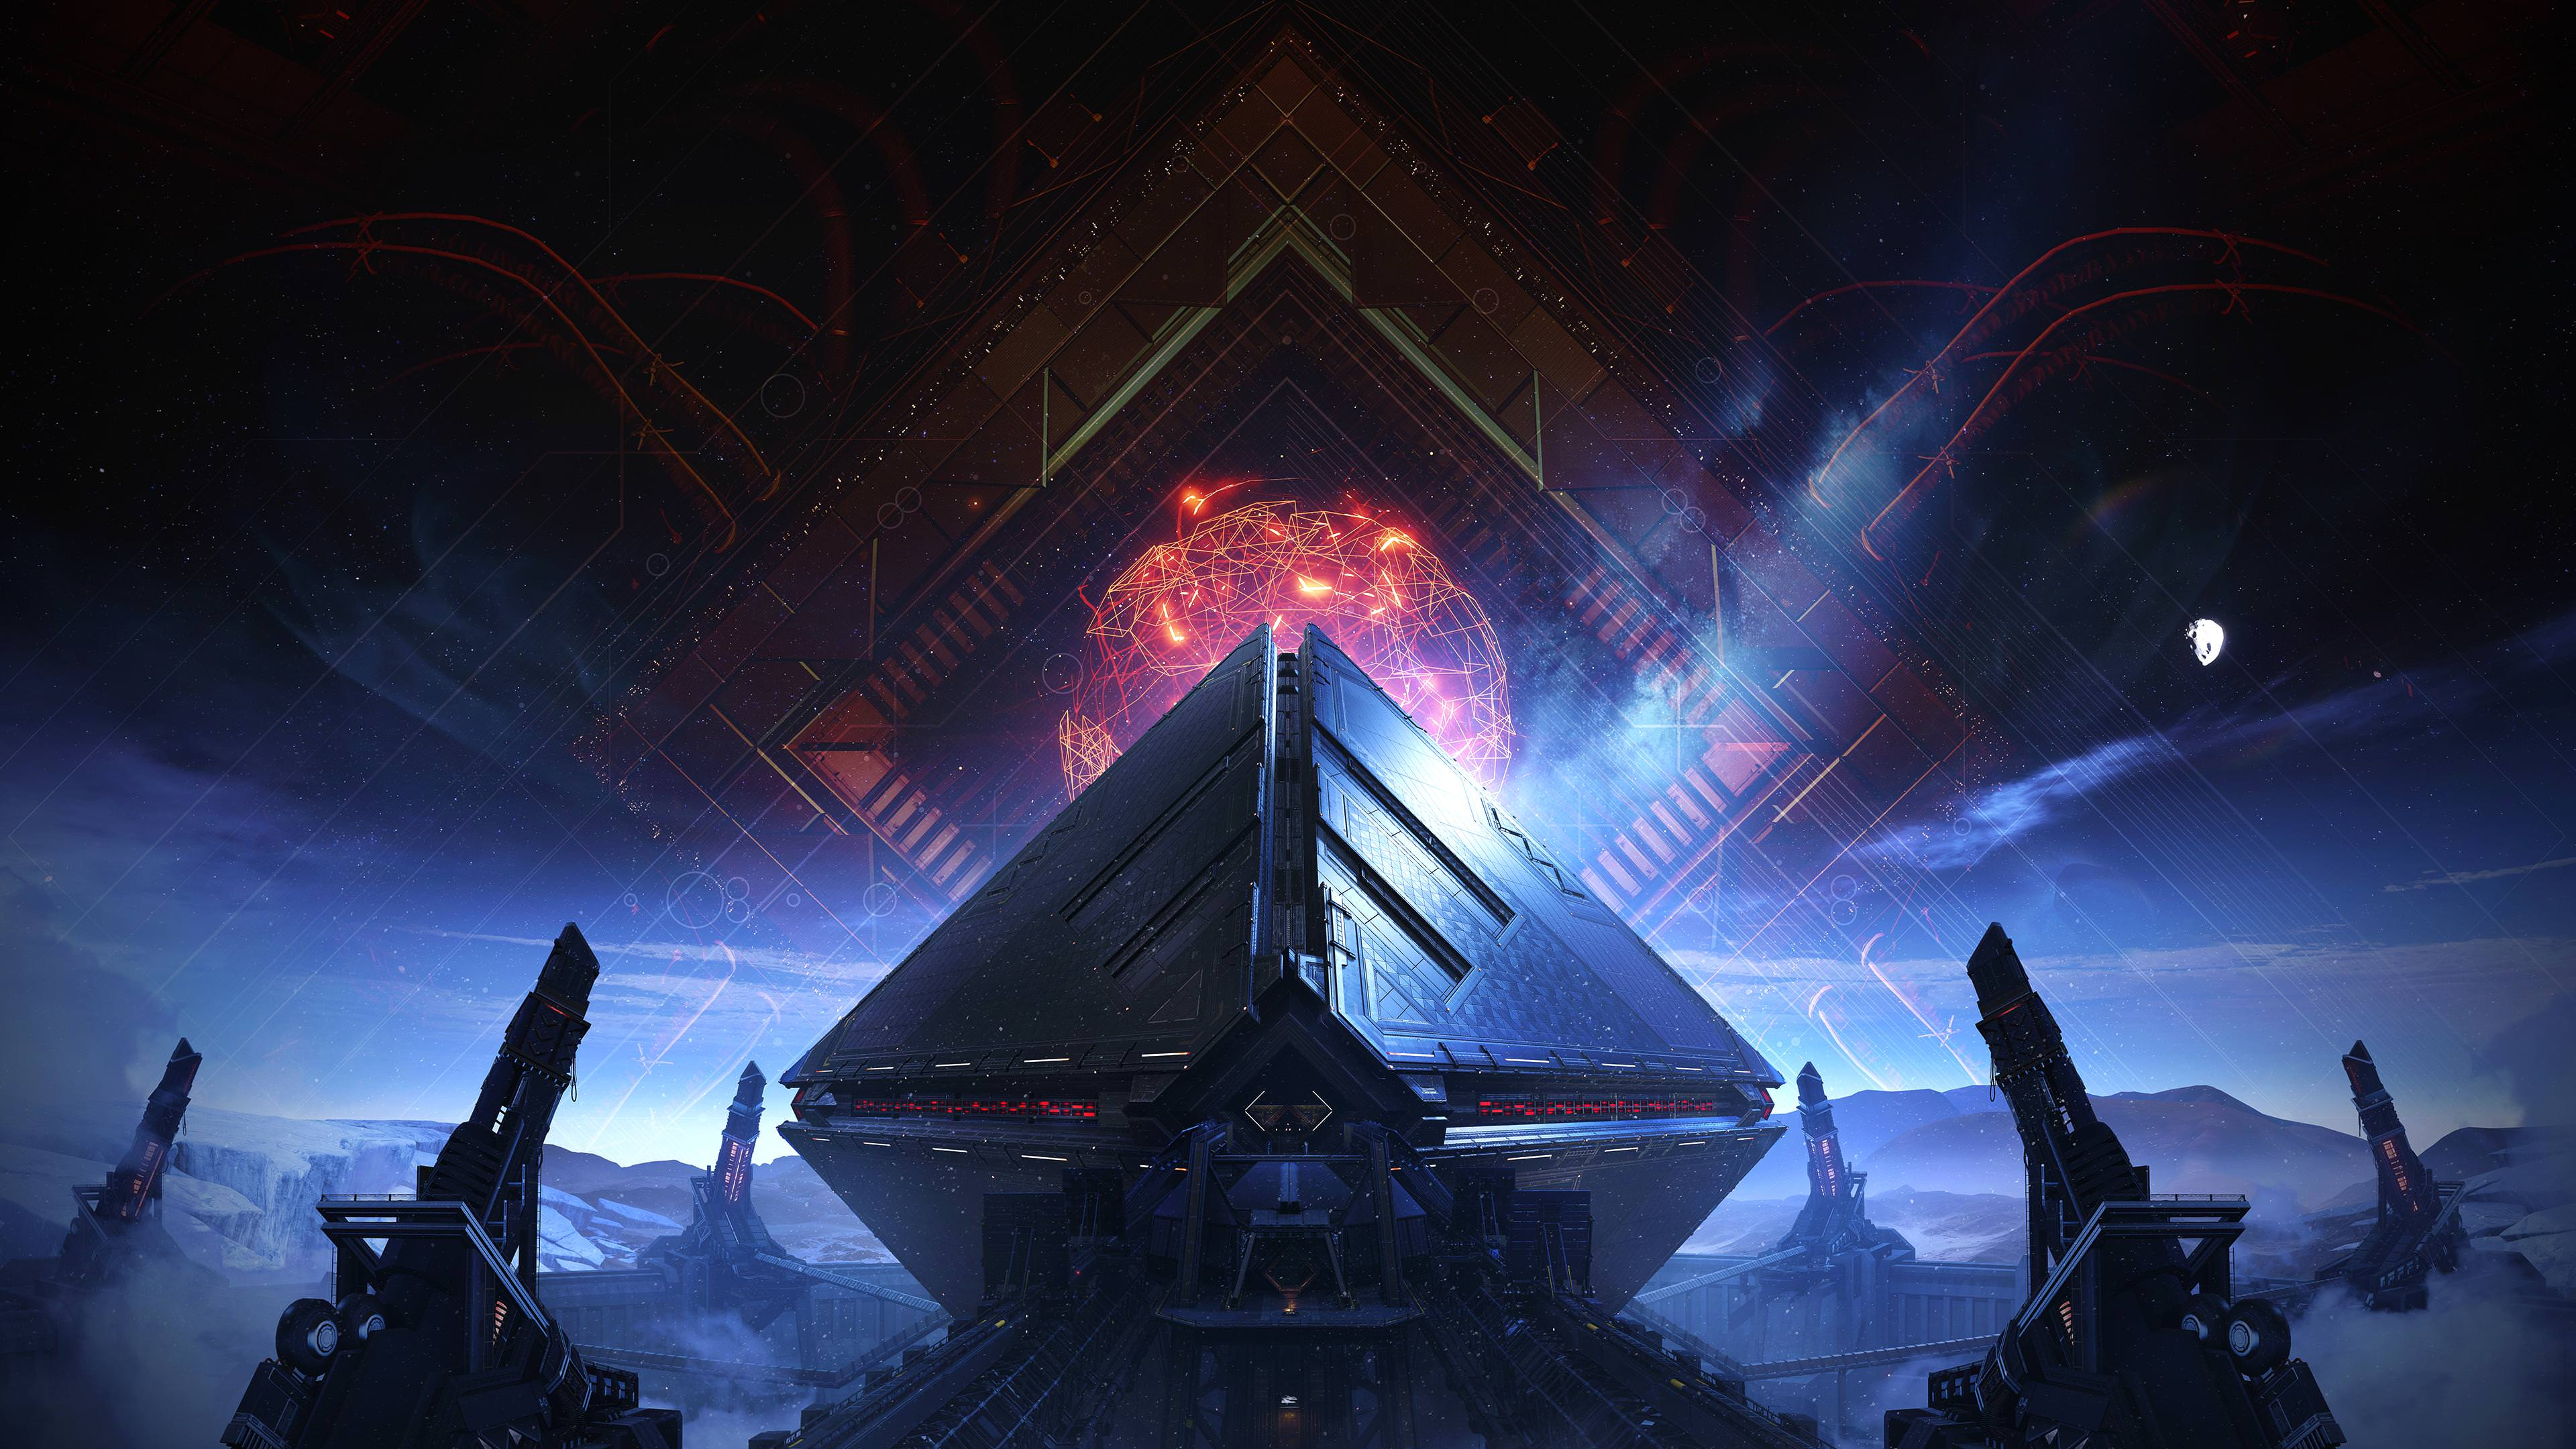 Destiny 2 Warmind Hd Games 4k Wallpapers Images